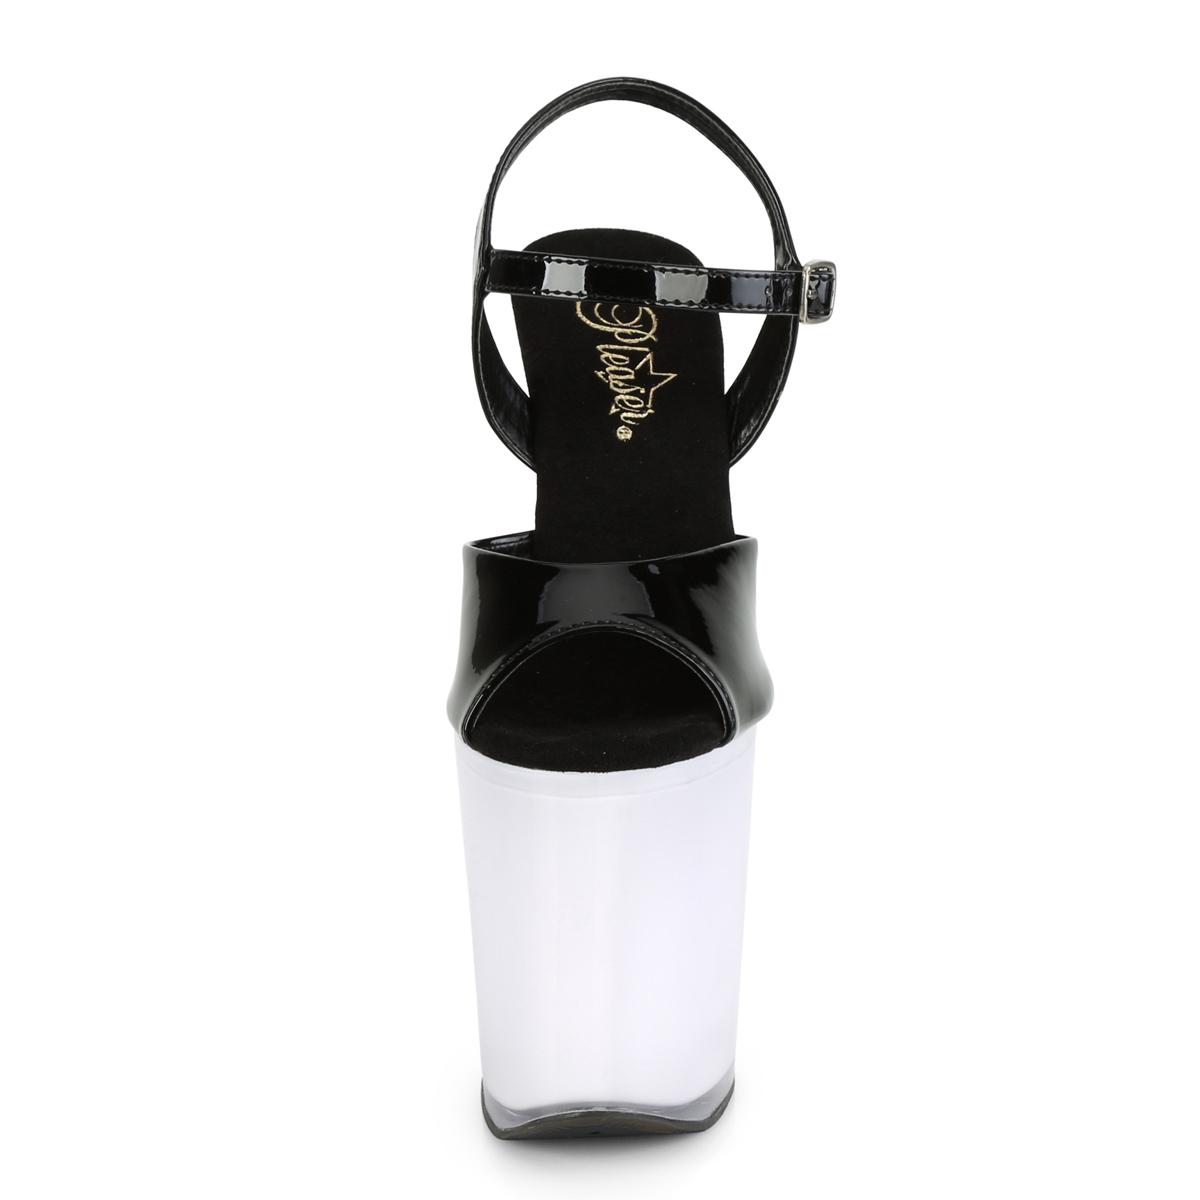 Pleaser(プリーザー) DISCOLITE-809 LEDイルミネーション厚底サンダル USB充電 エナメル黒/ホワイトグロウ◆取り寄せ